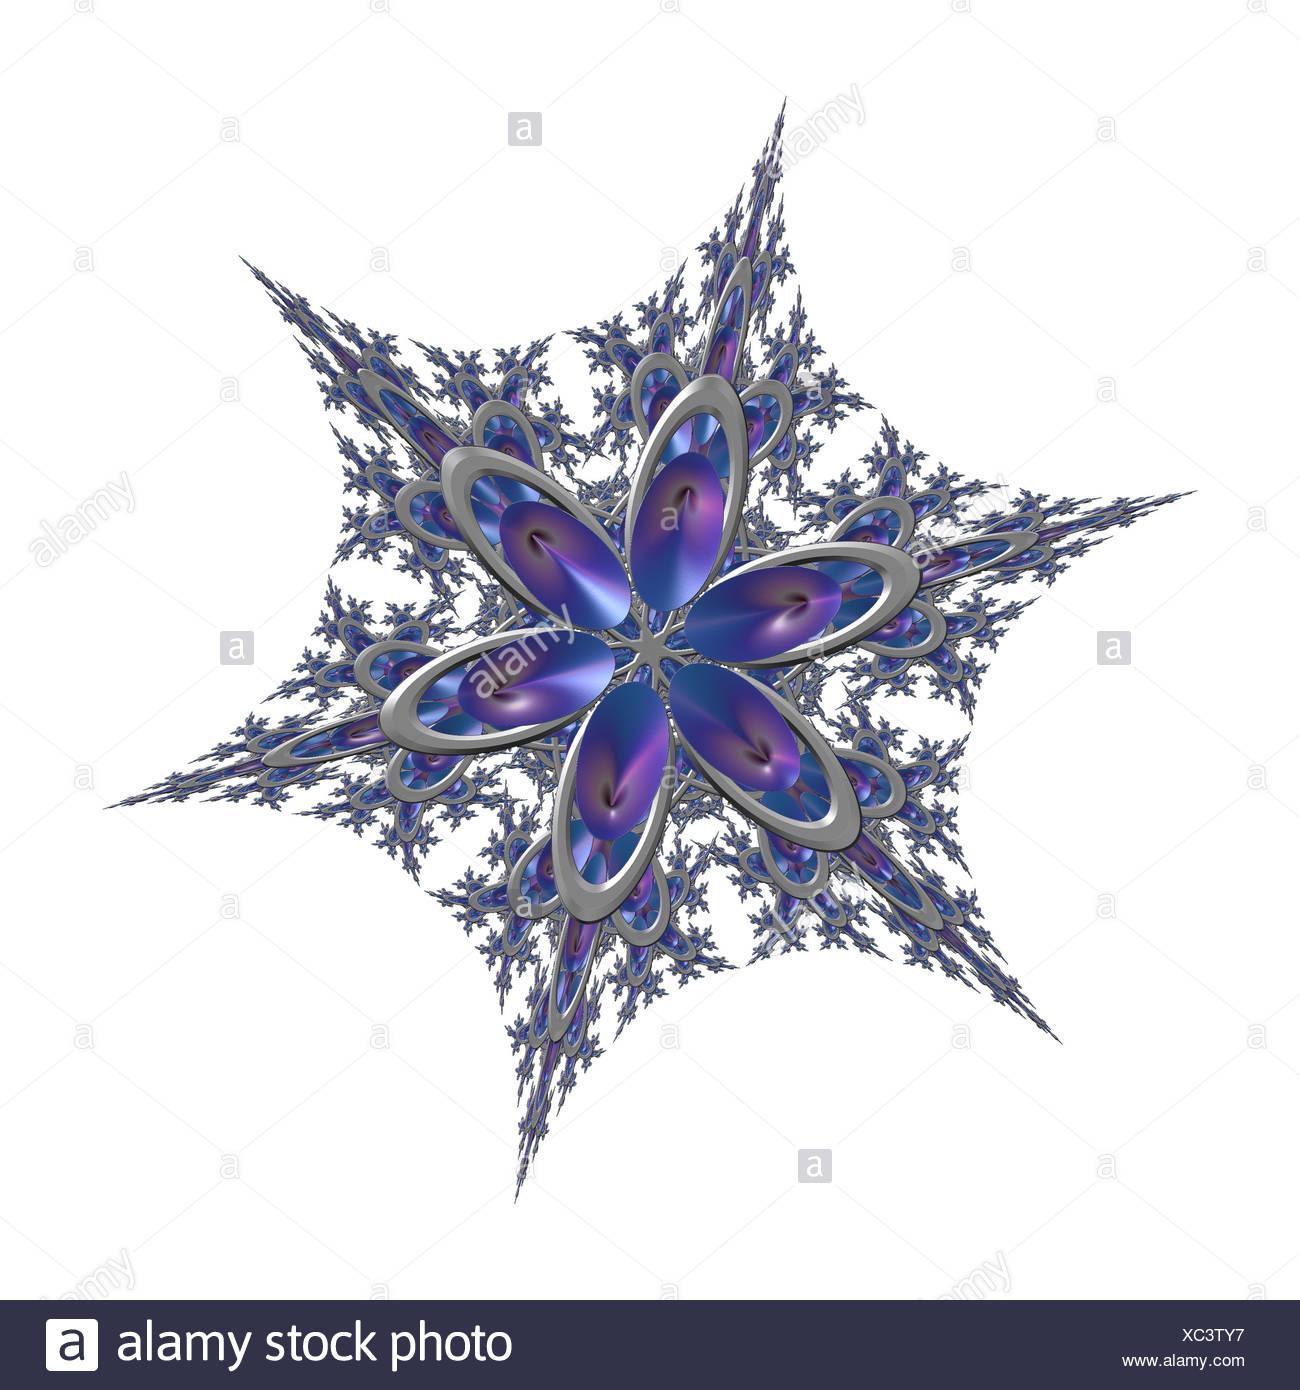 star 38 - Stock Image